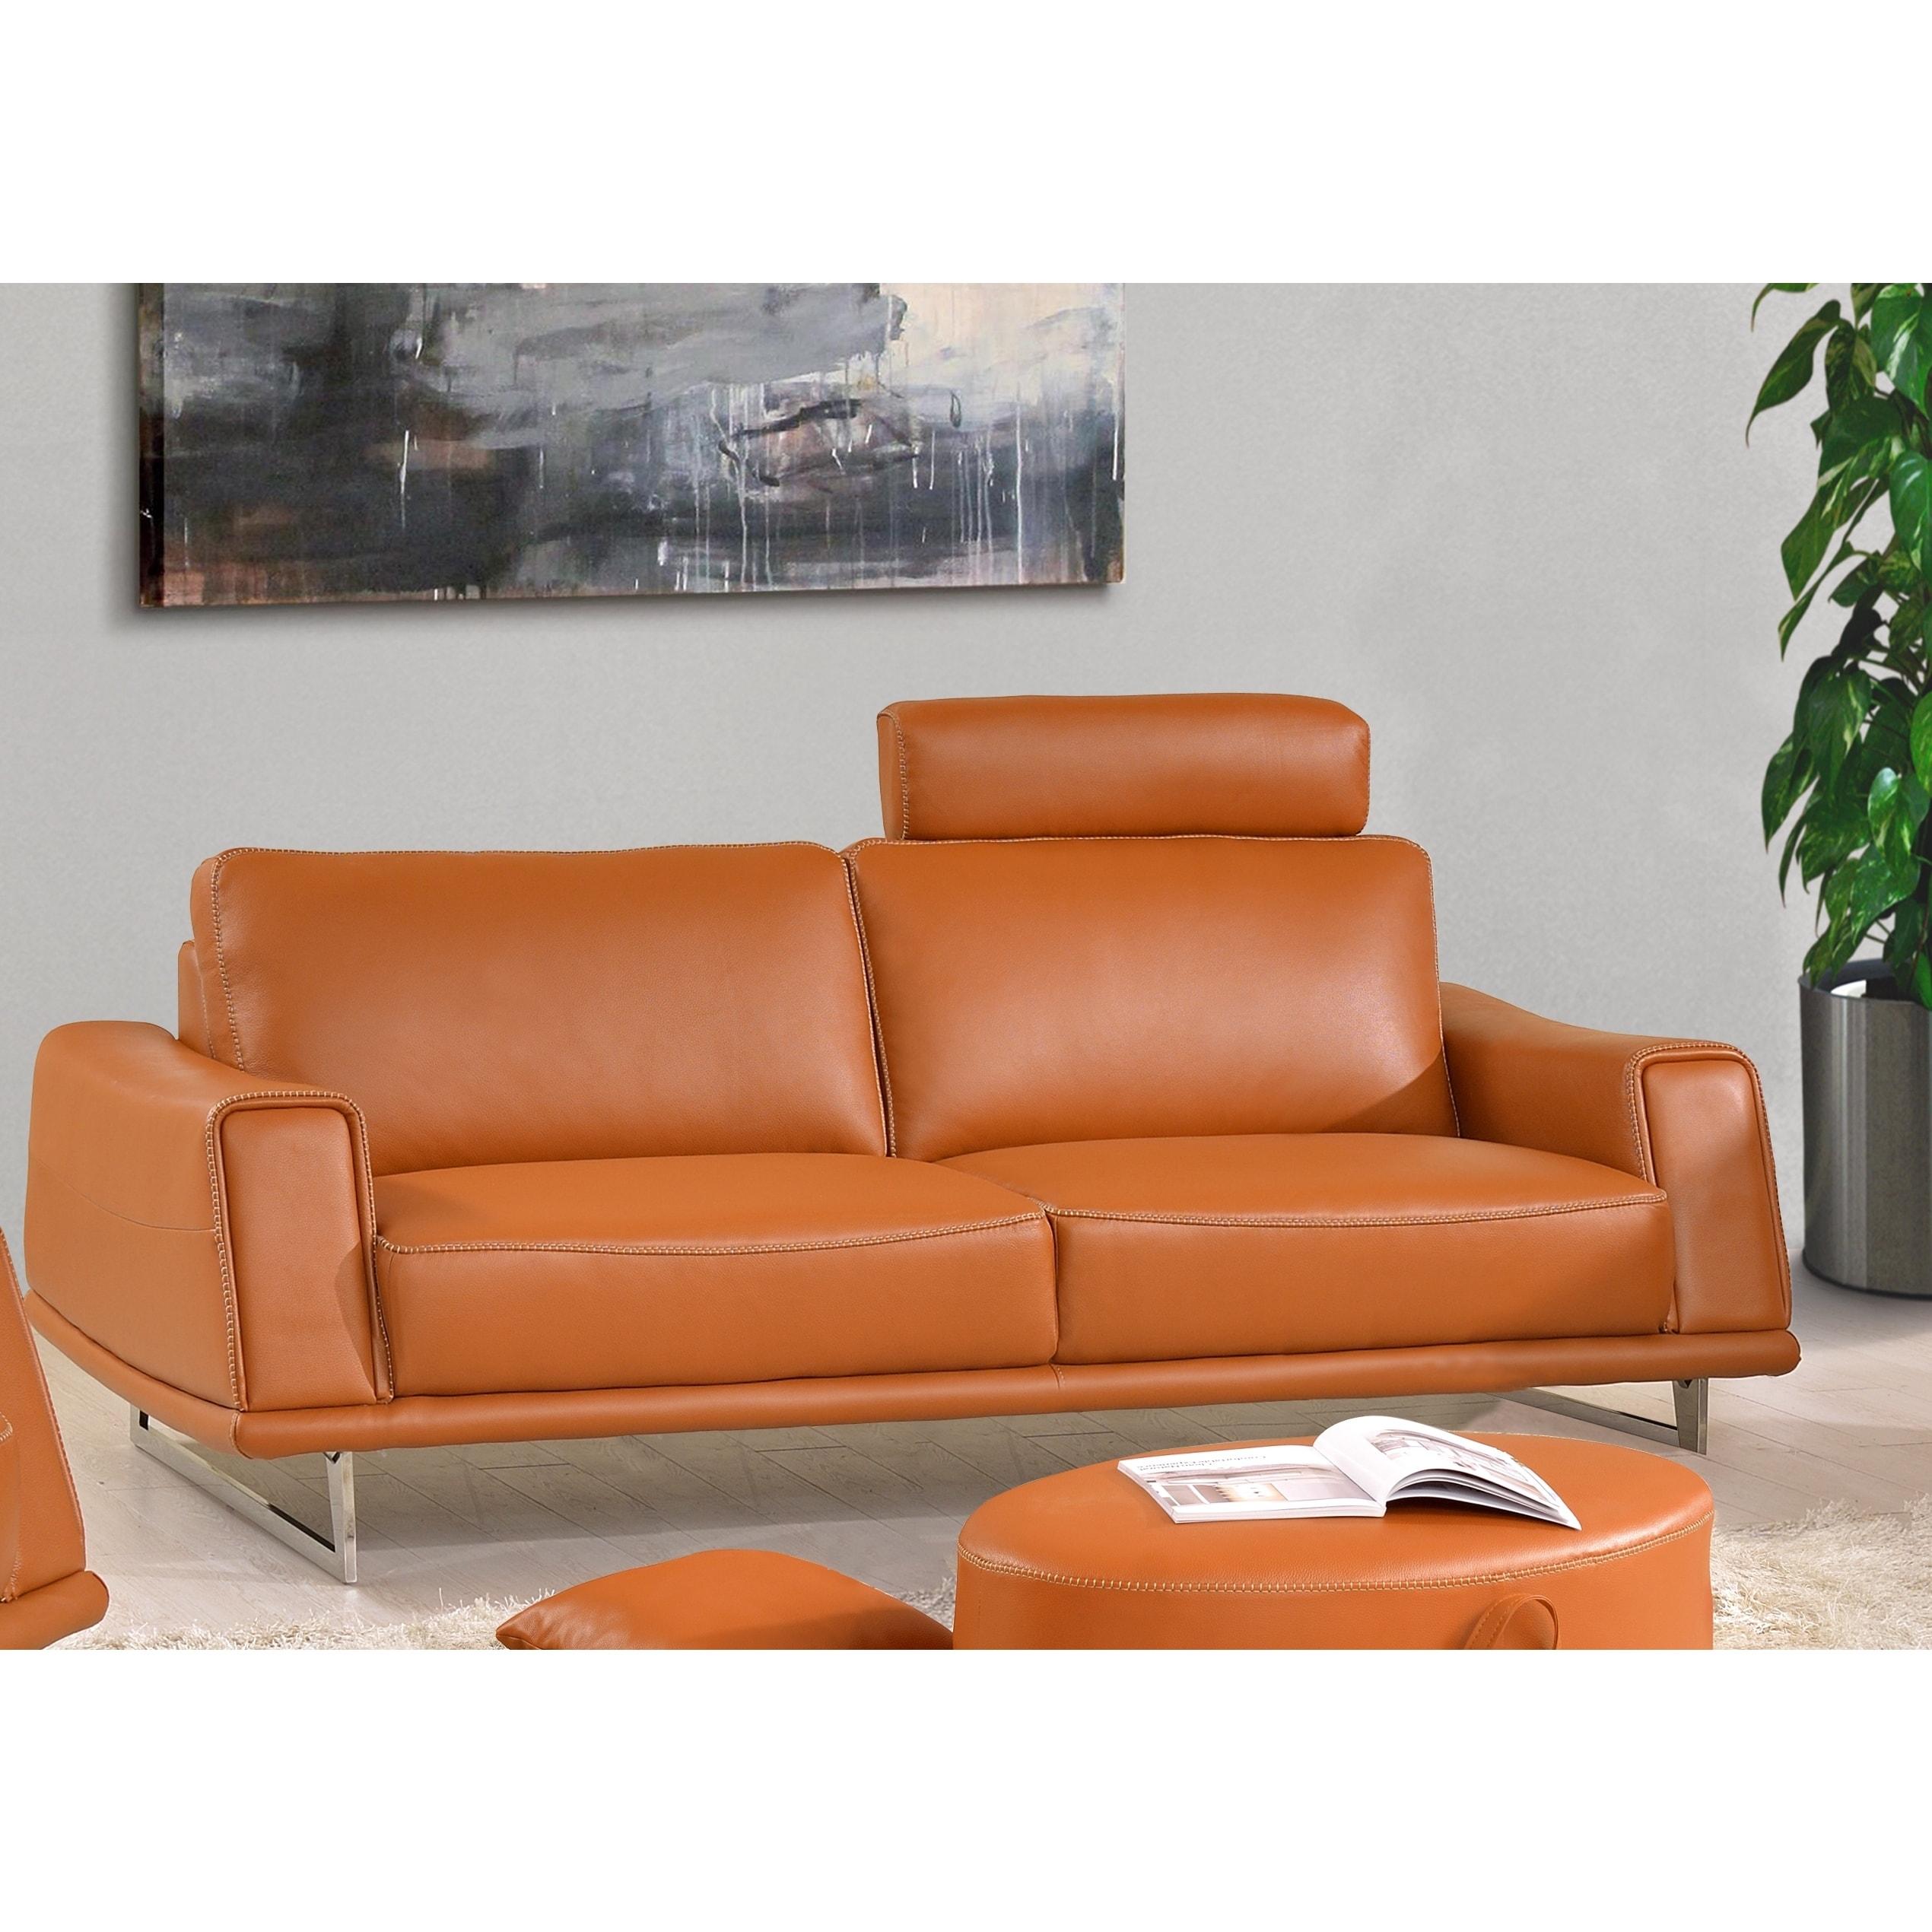 Luca Home Sofa Split Leather Orange Free Shipping Today 12237631